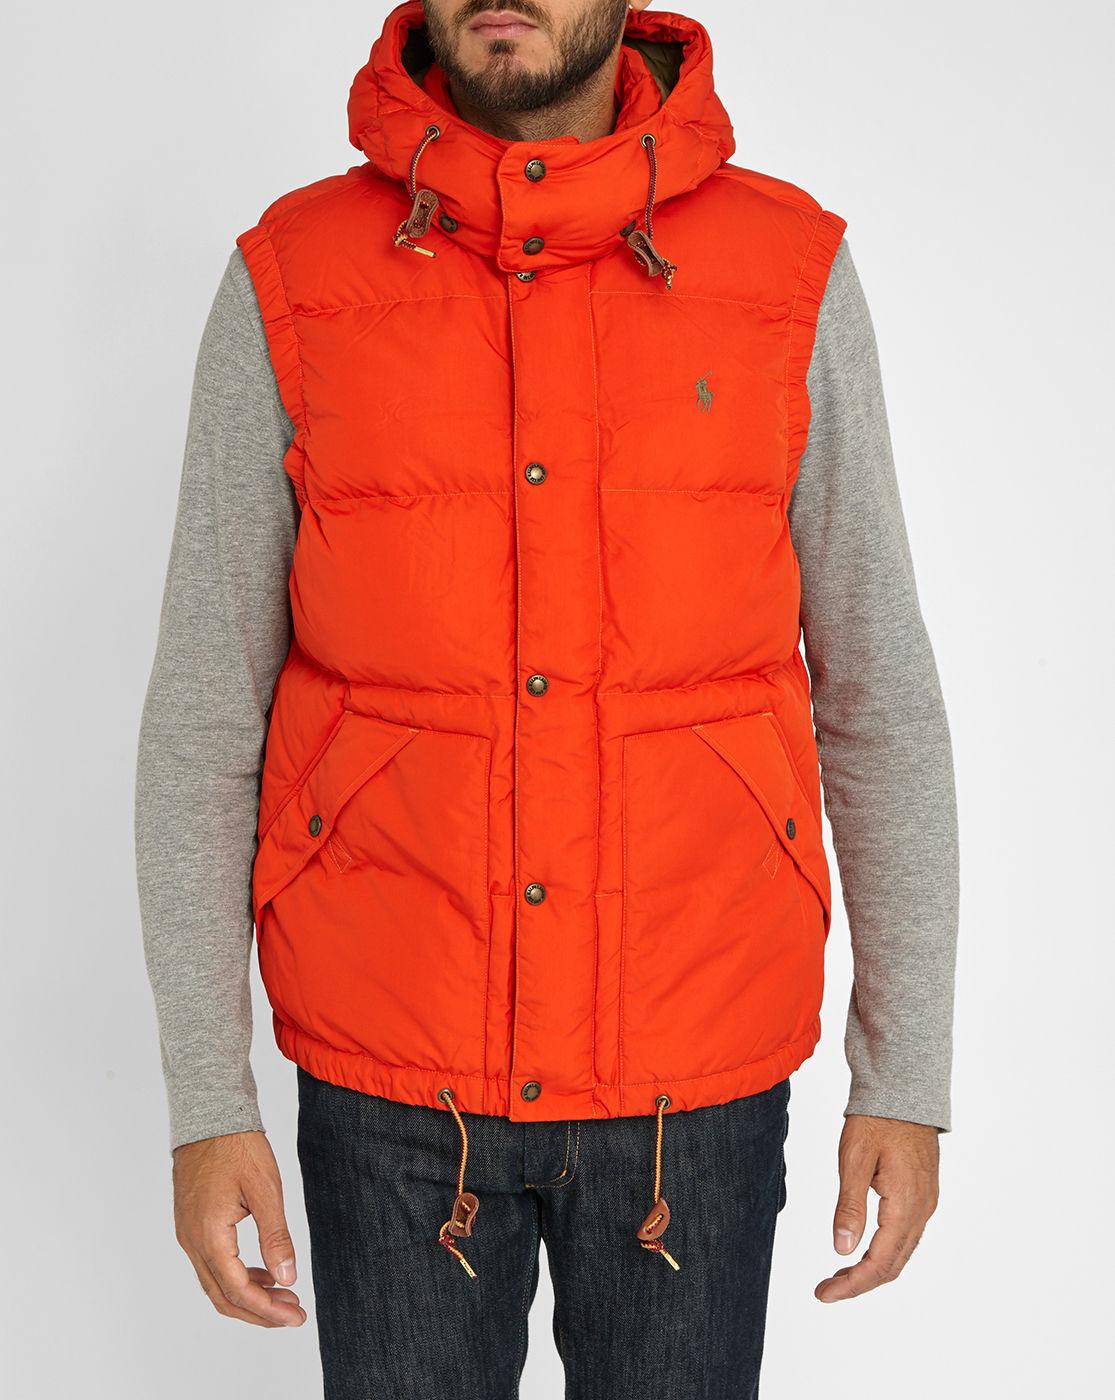 polo ralph lauren orange retro sleeveless down jacket in